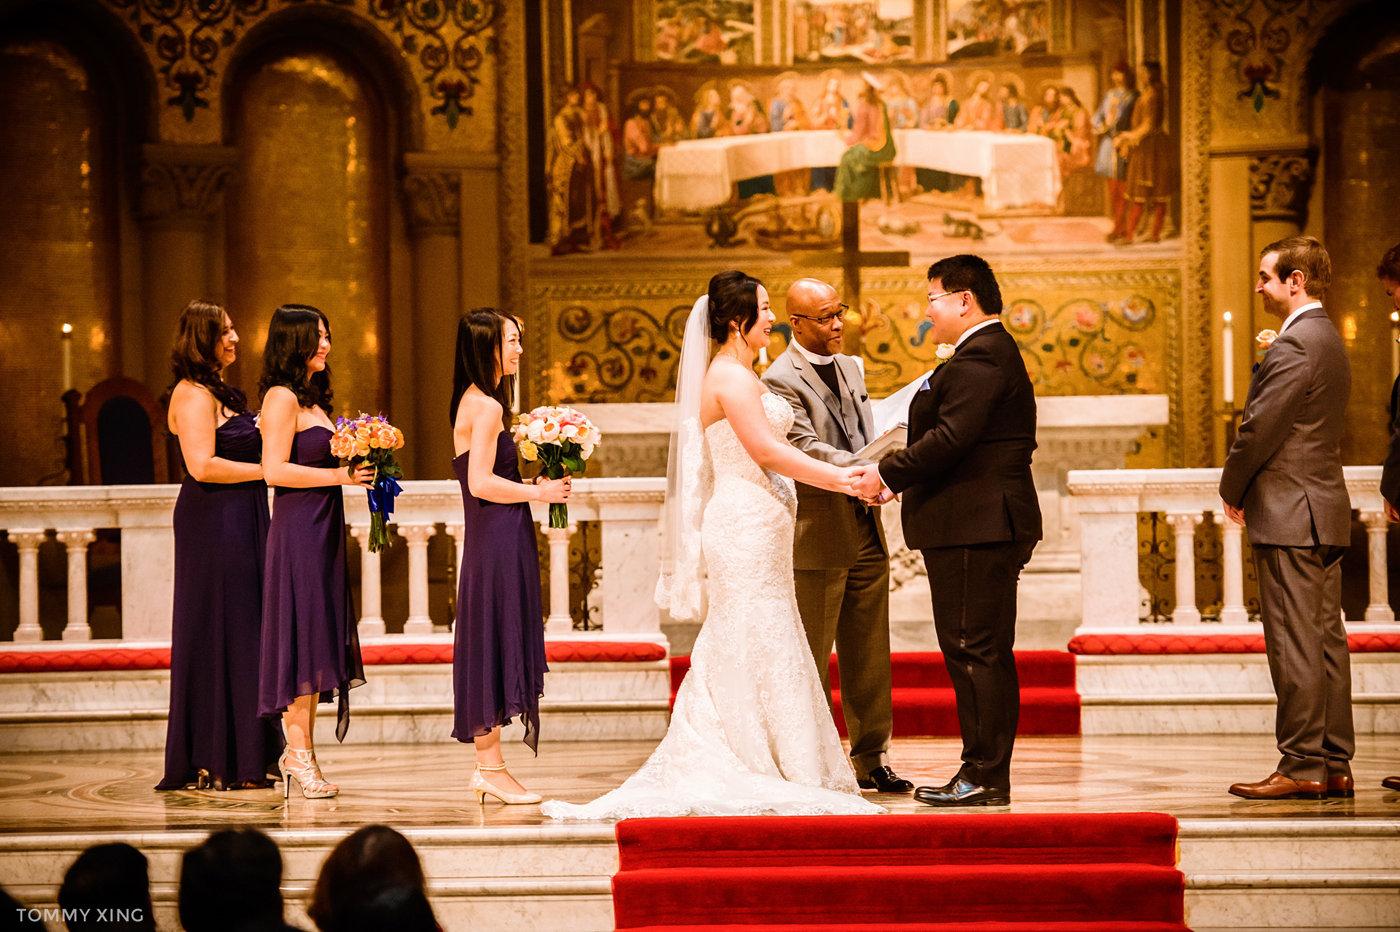 STANFORD MEMORIAL CHURCH WEDDING - Wenjie & Chengcheng - SAN FRANCISCO BAY AREA 斯坦福教堂婚礼跟拍 - 洛杉矶婚礼婚纱照摄影师 Tommy Xing Photography097.jpg